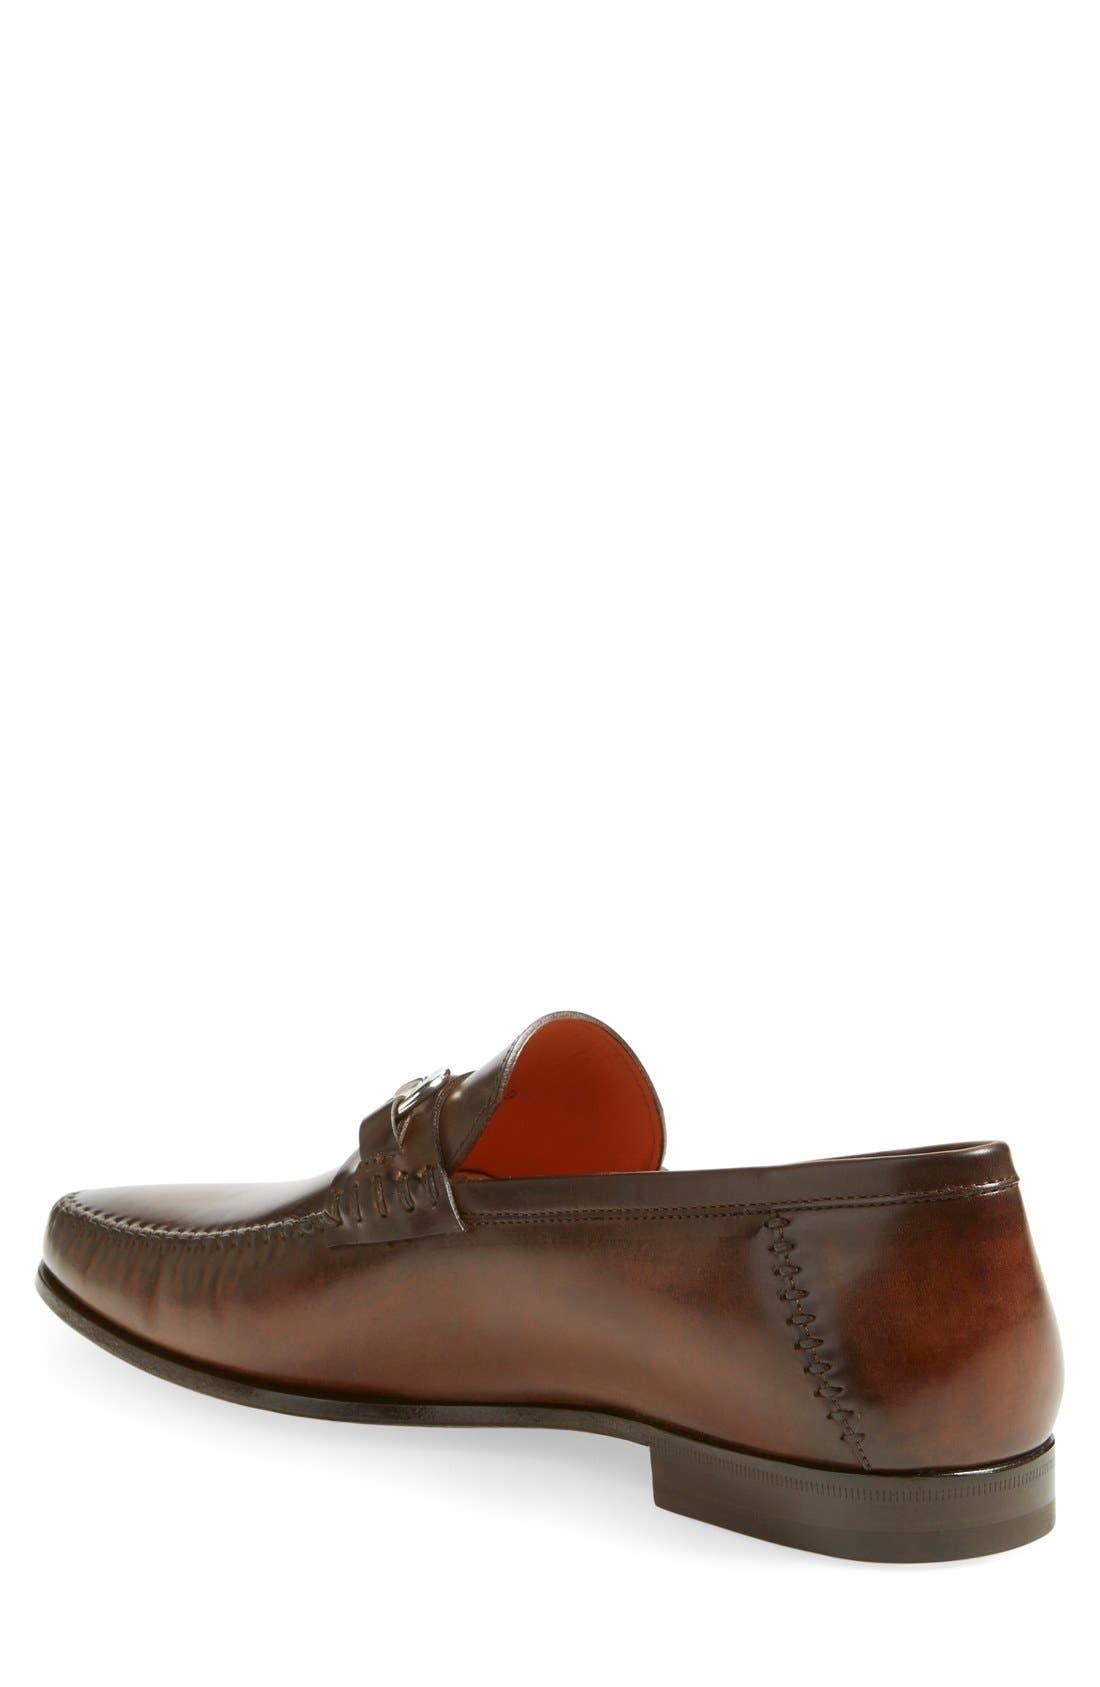 'Egan' Bit Loafer,                             Alternate thumbnail 2, color,                             Brown Leather